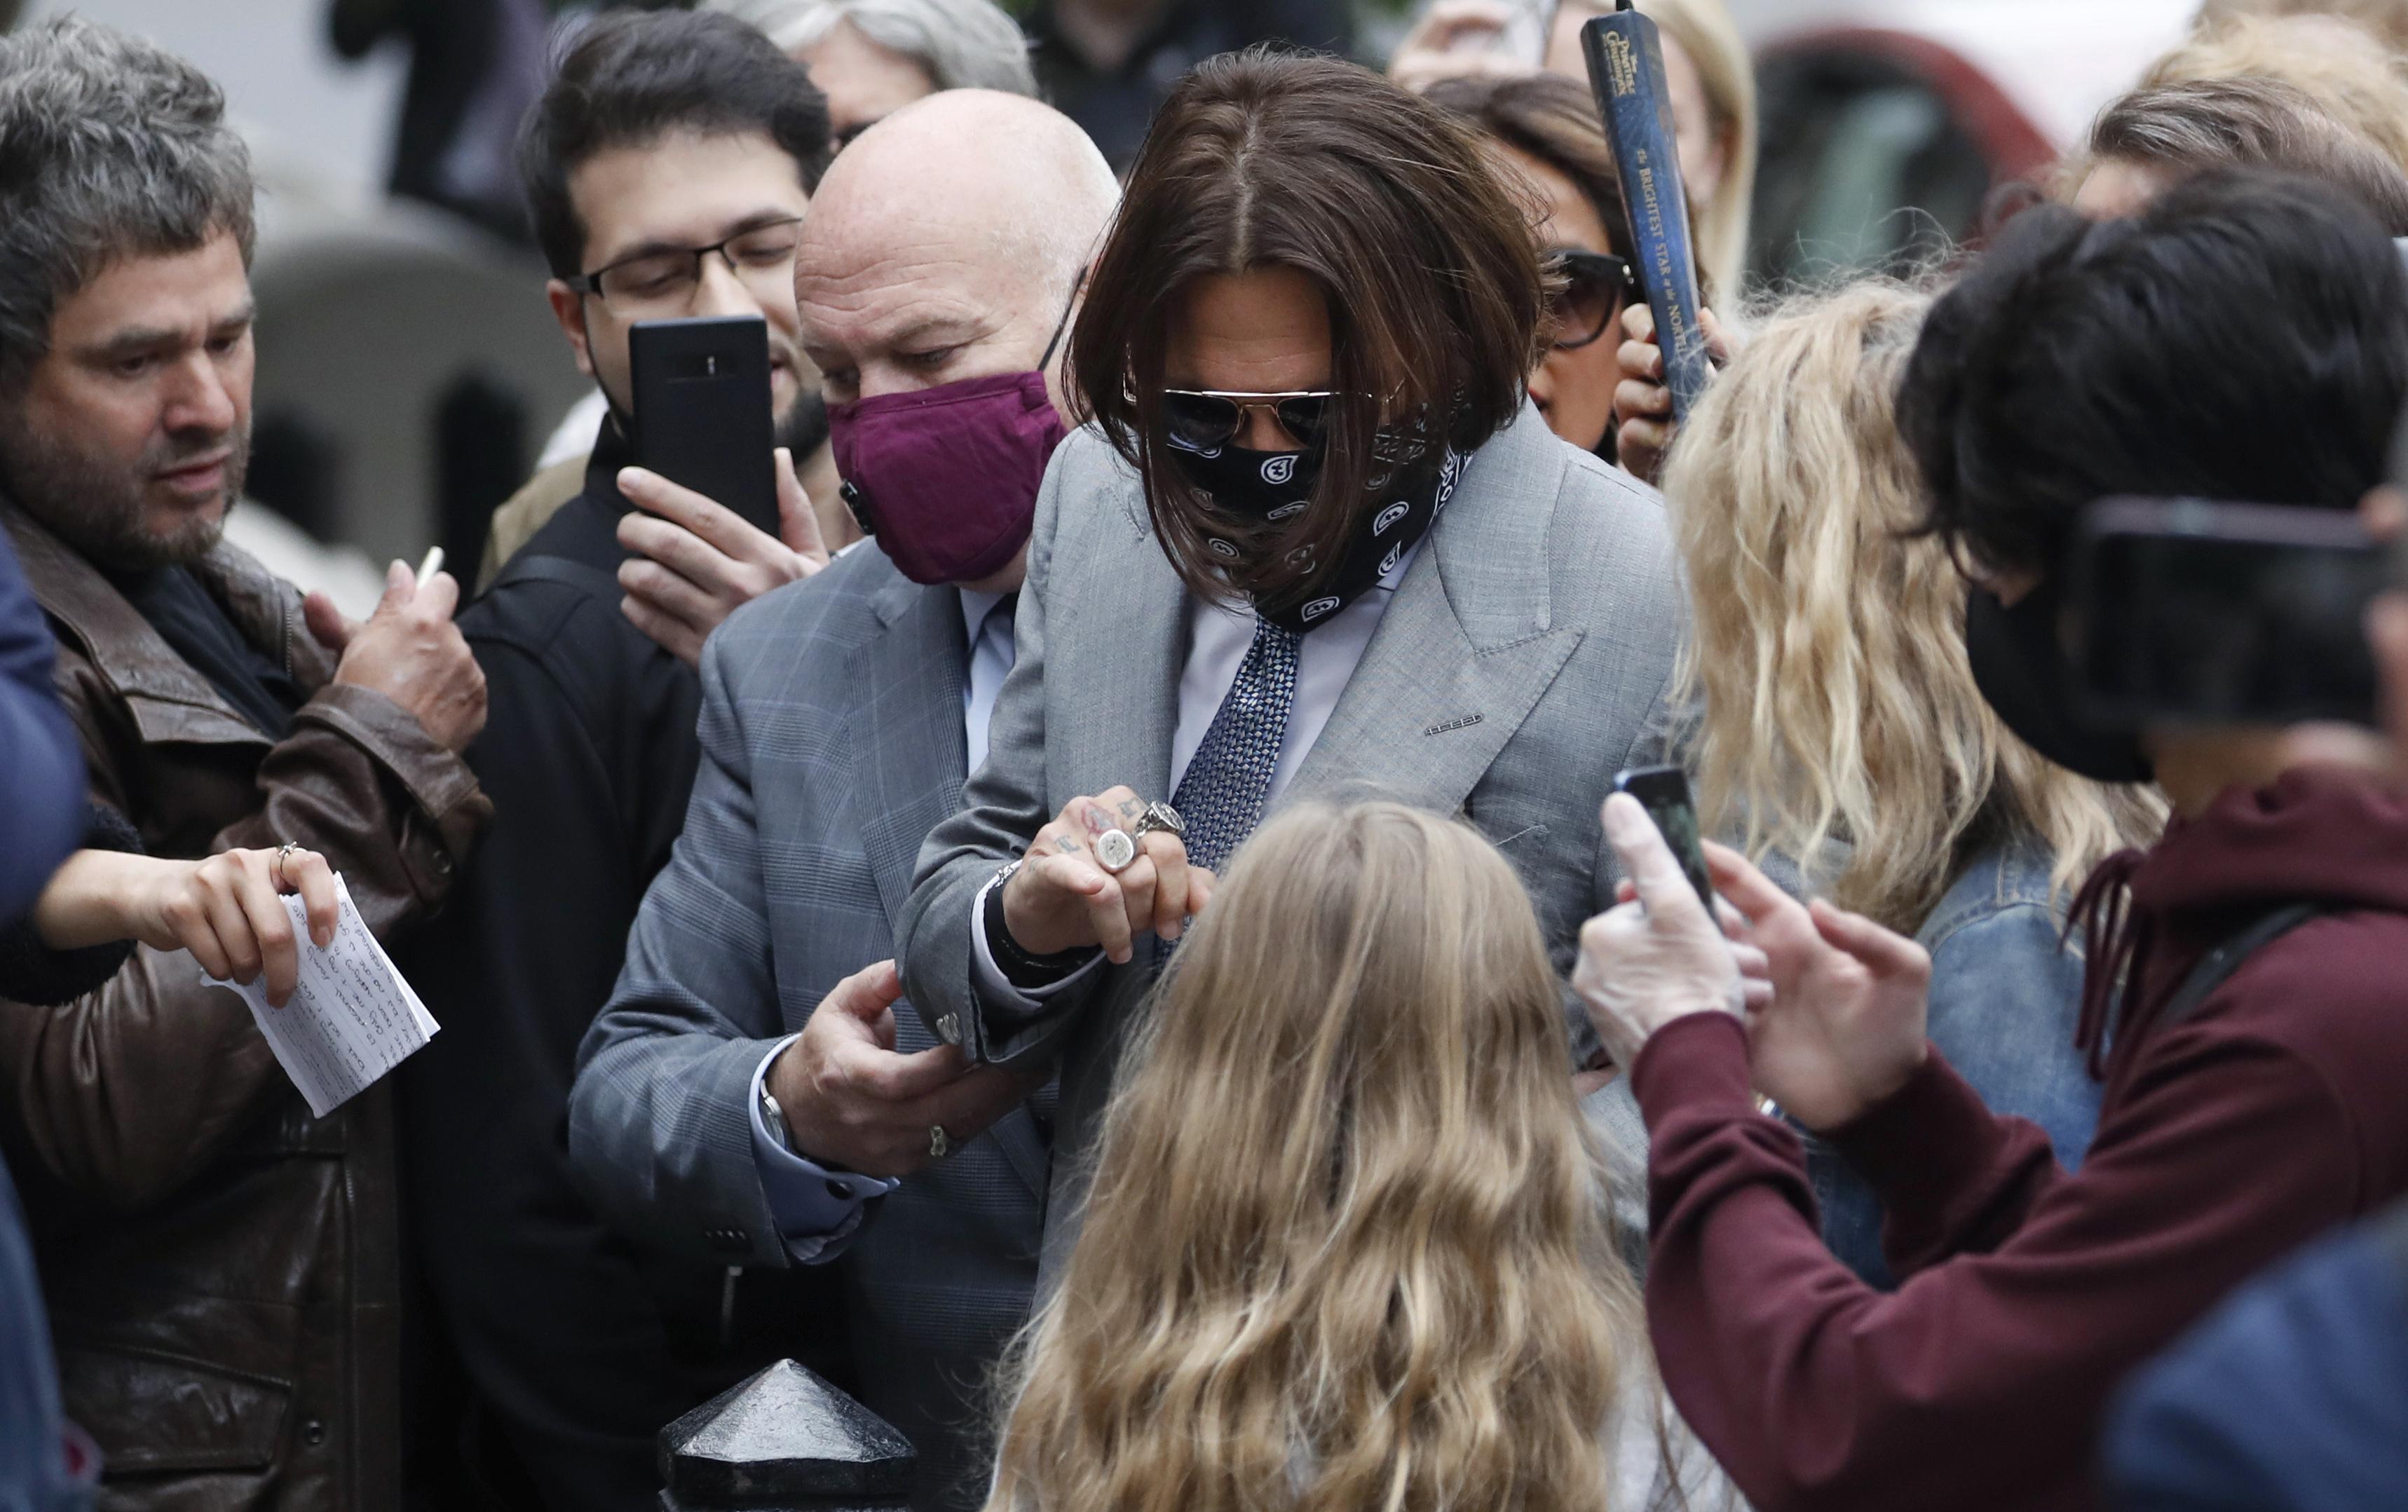 Depp S Bodyguard Says Amber Heard Abused The Hollywood Star Krqe News 13